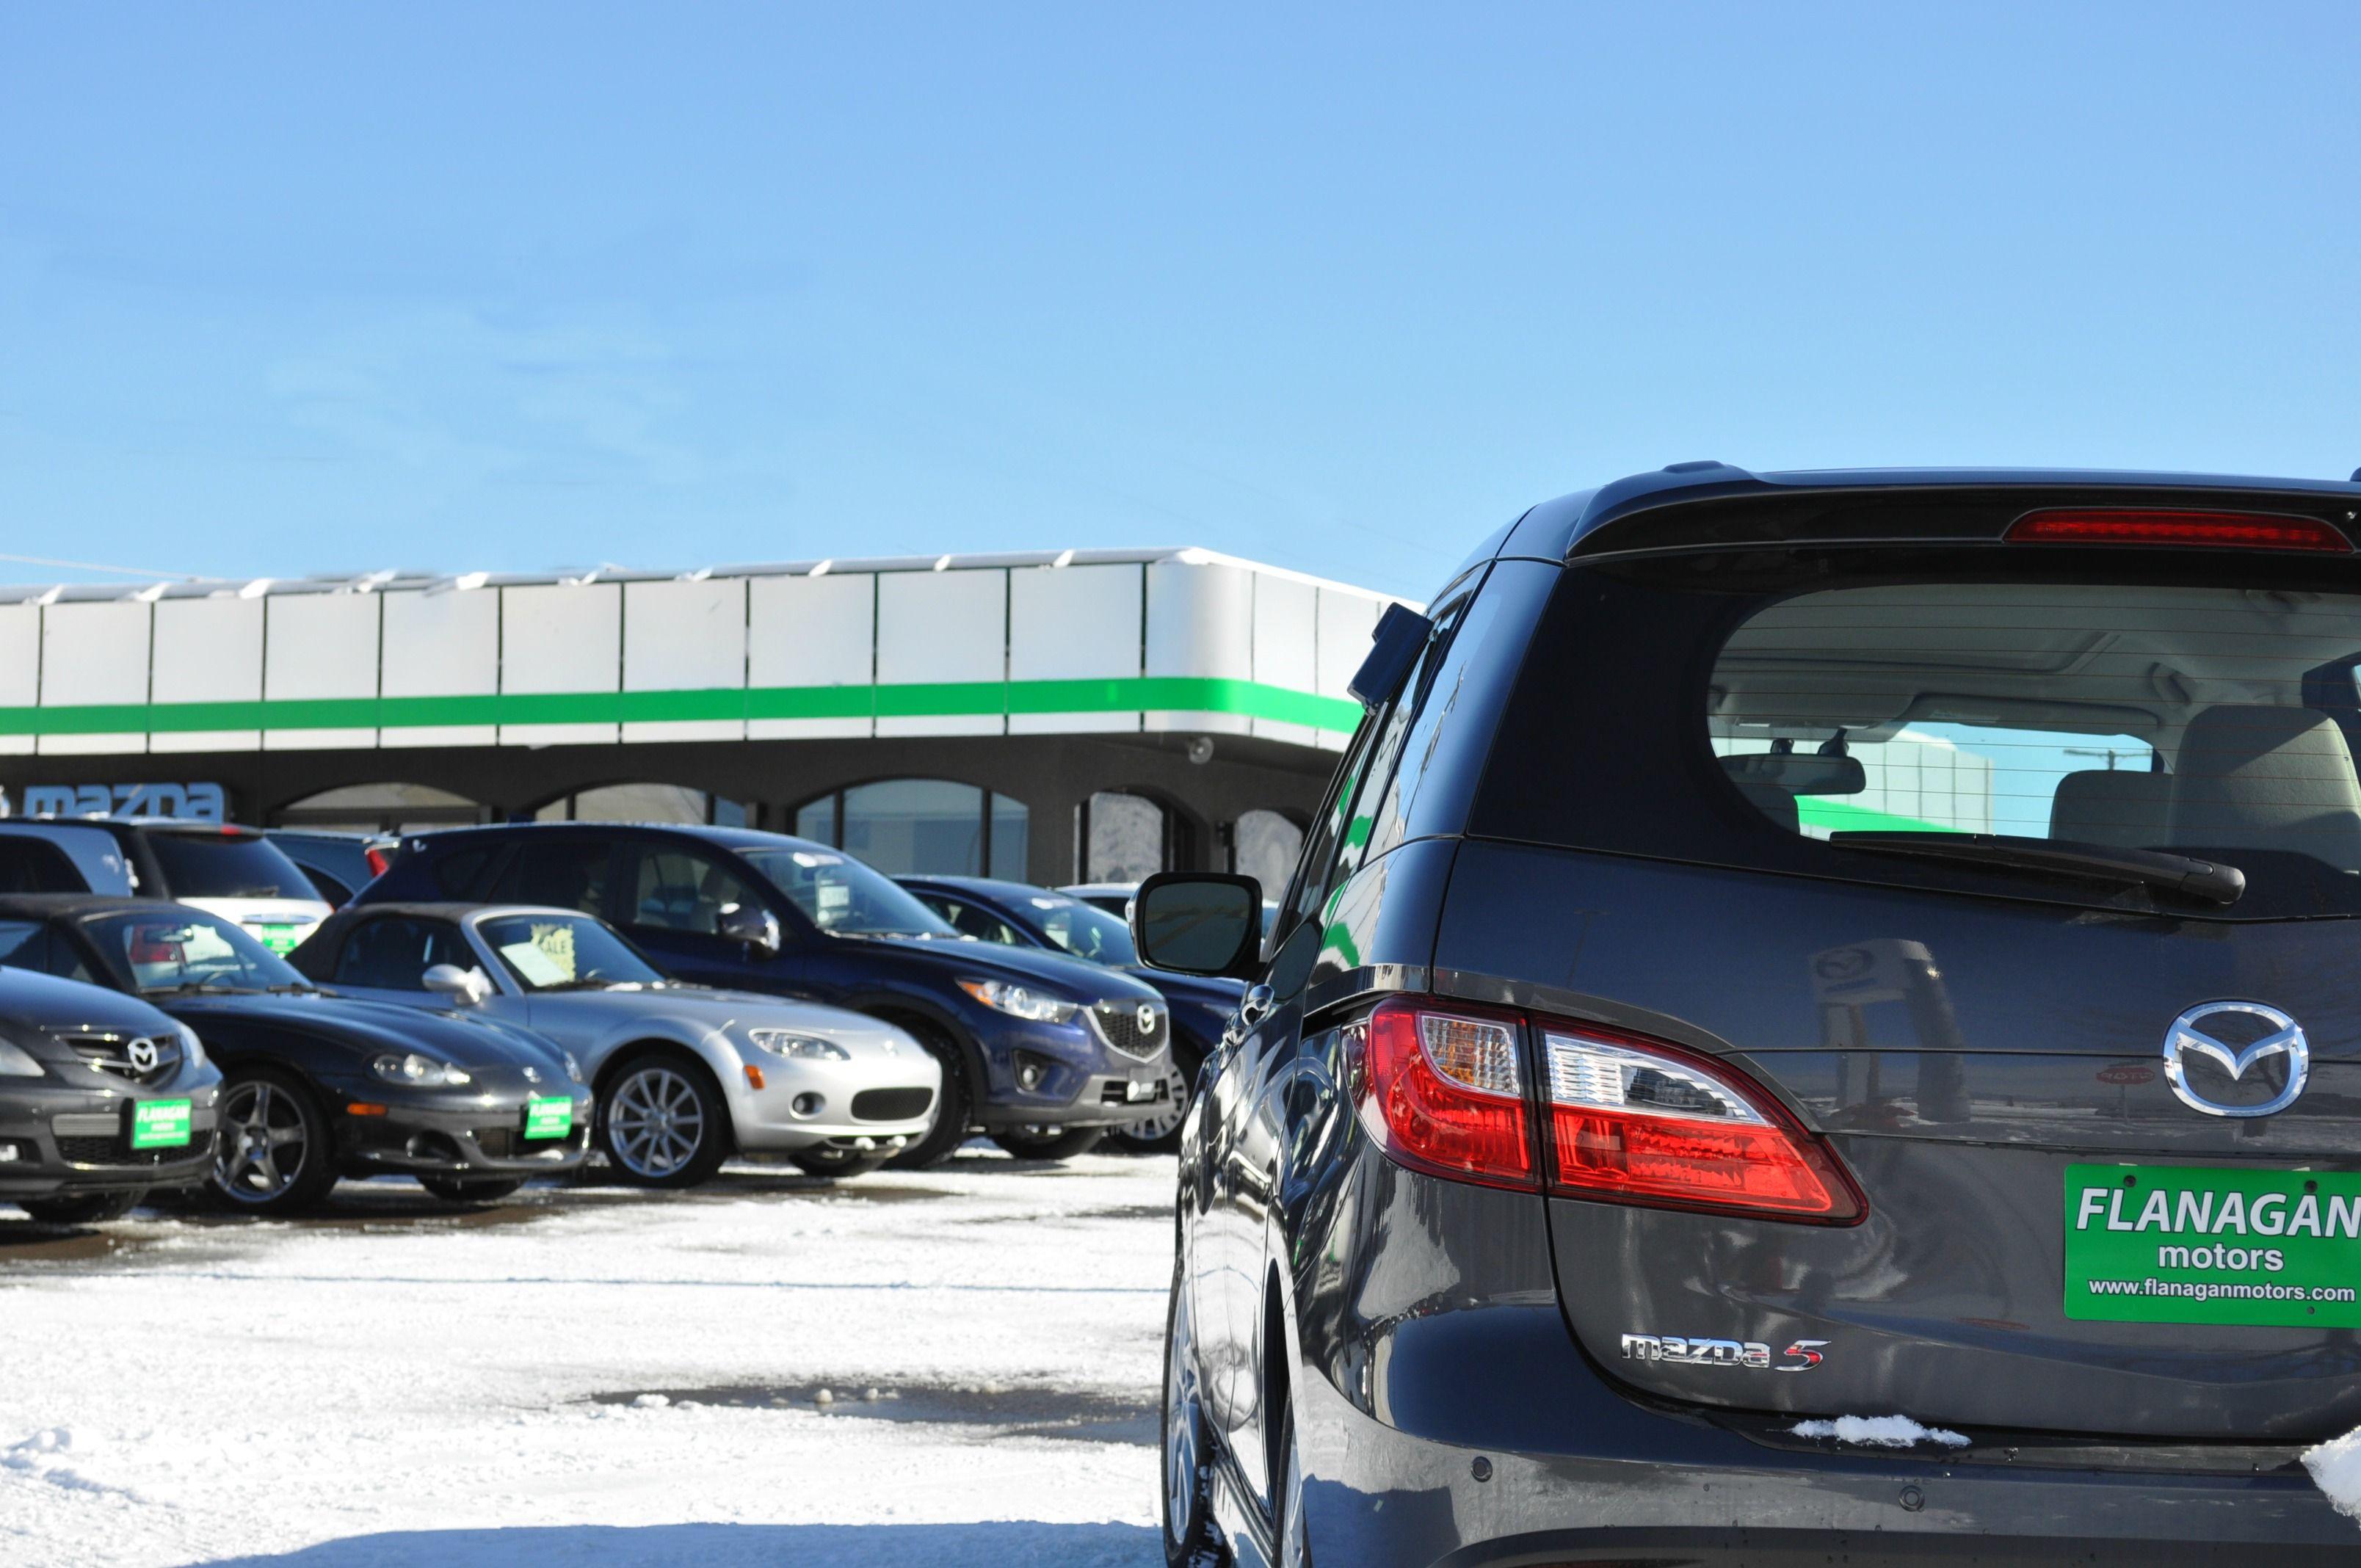 Winter at the dealership. Beautiful skies. http